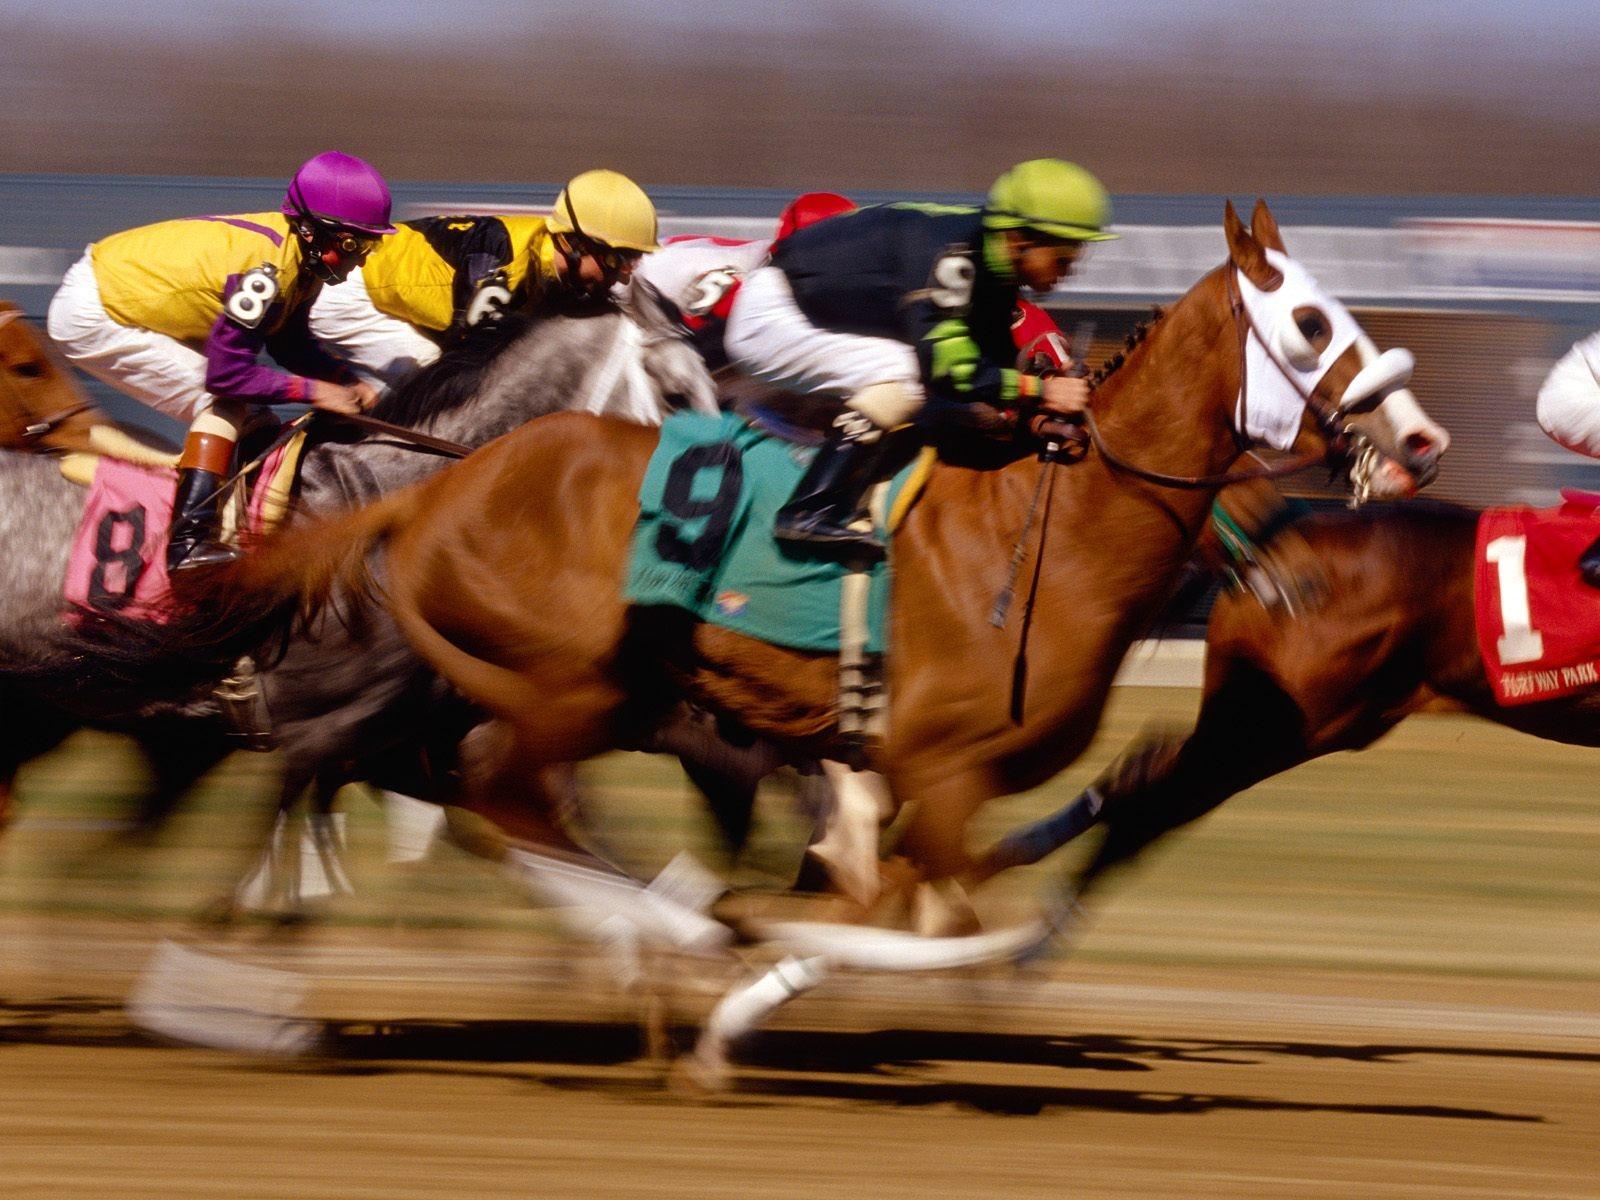 thoroughbred-horse-racing-2908